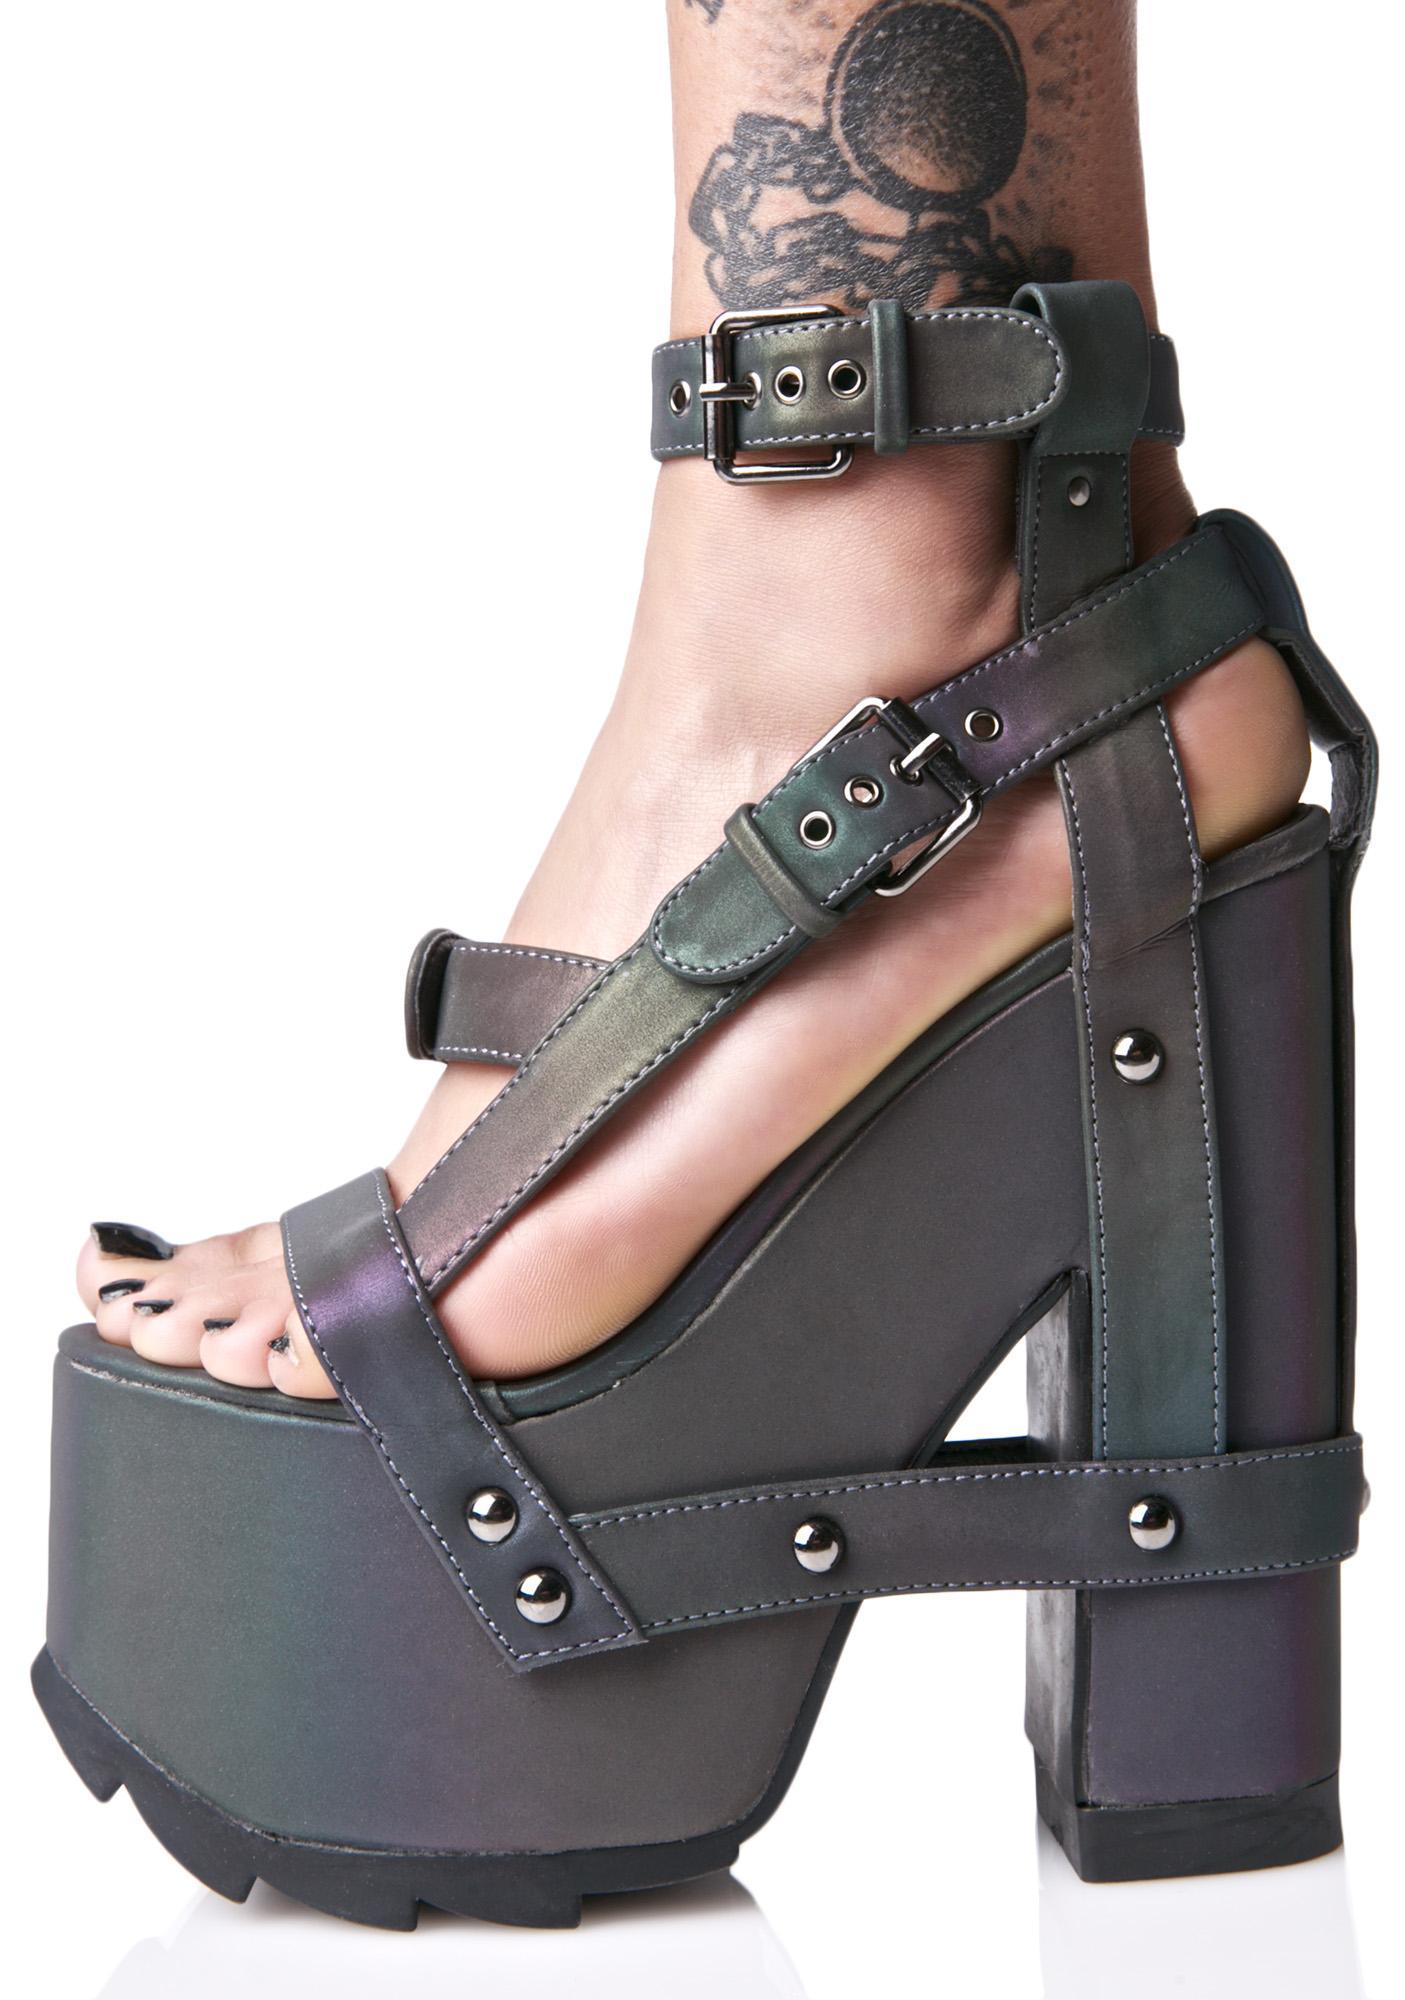 Y.R.U. Nightcall Reflective Platform Heels